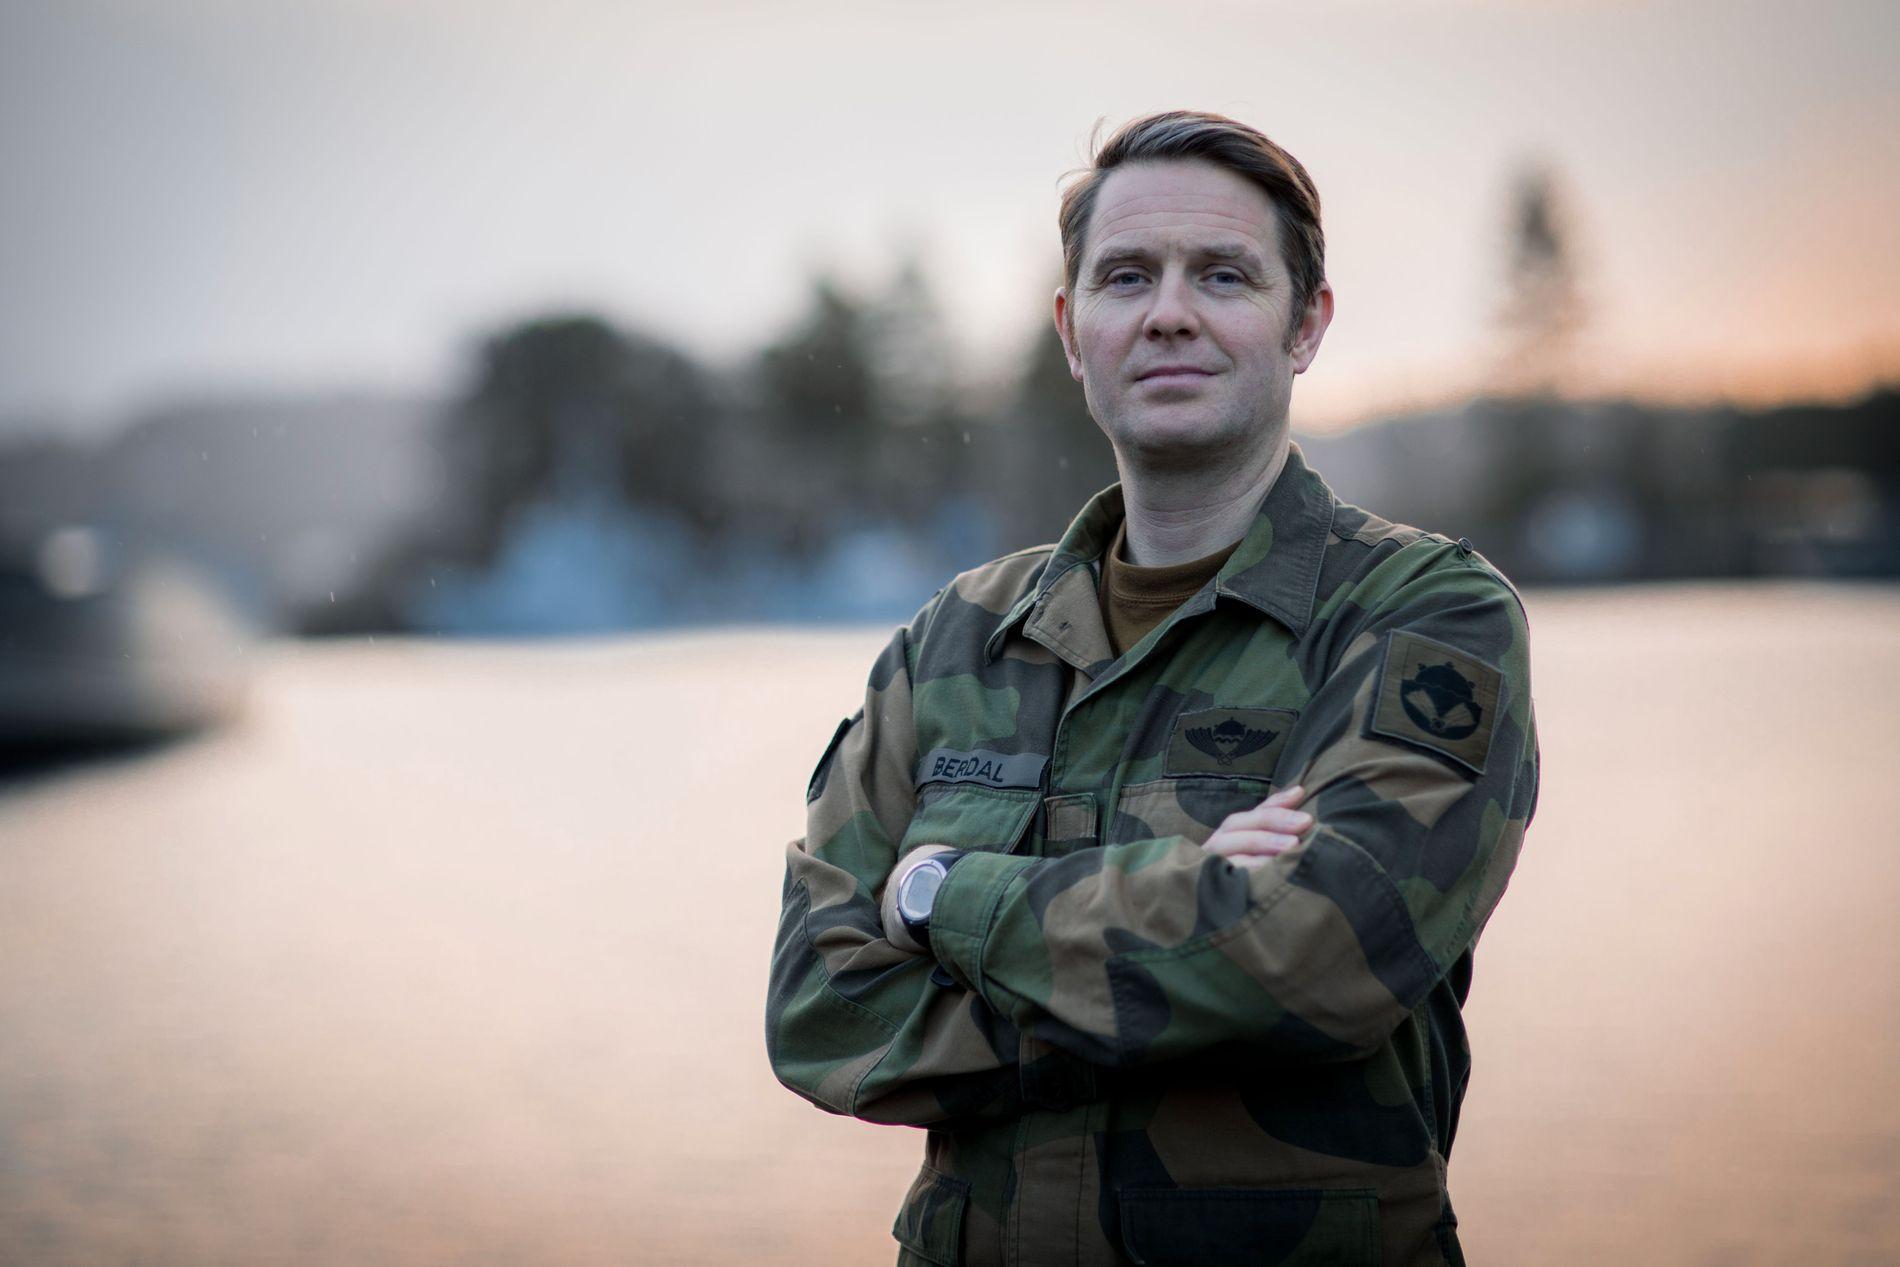 SJEF MINEDYKKERKOMMANDOEN: Orlogskaptein Bengt Berdal